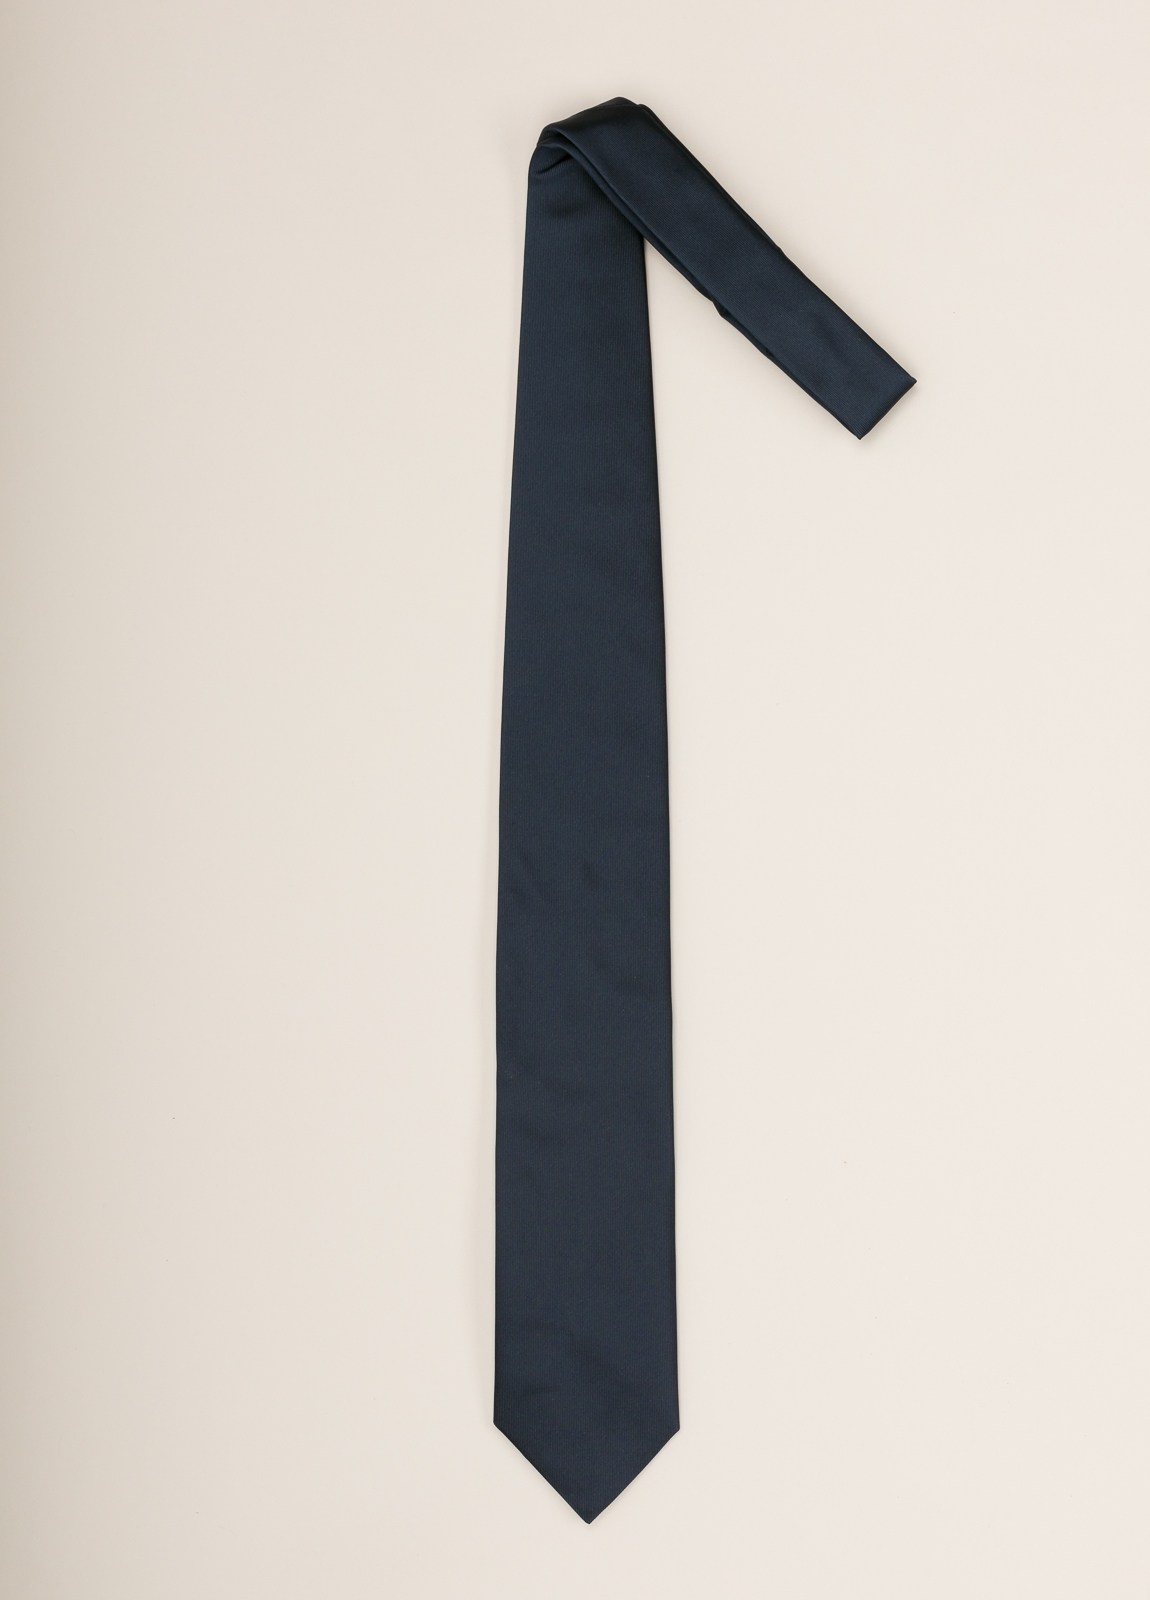 Corbata FUREST COLECCIÓN marino - Ítem1